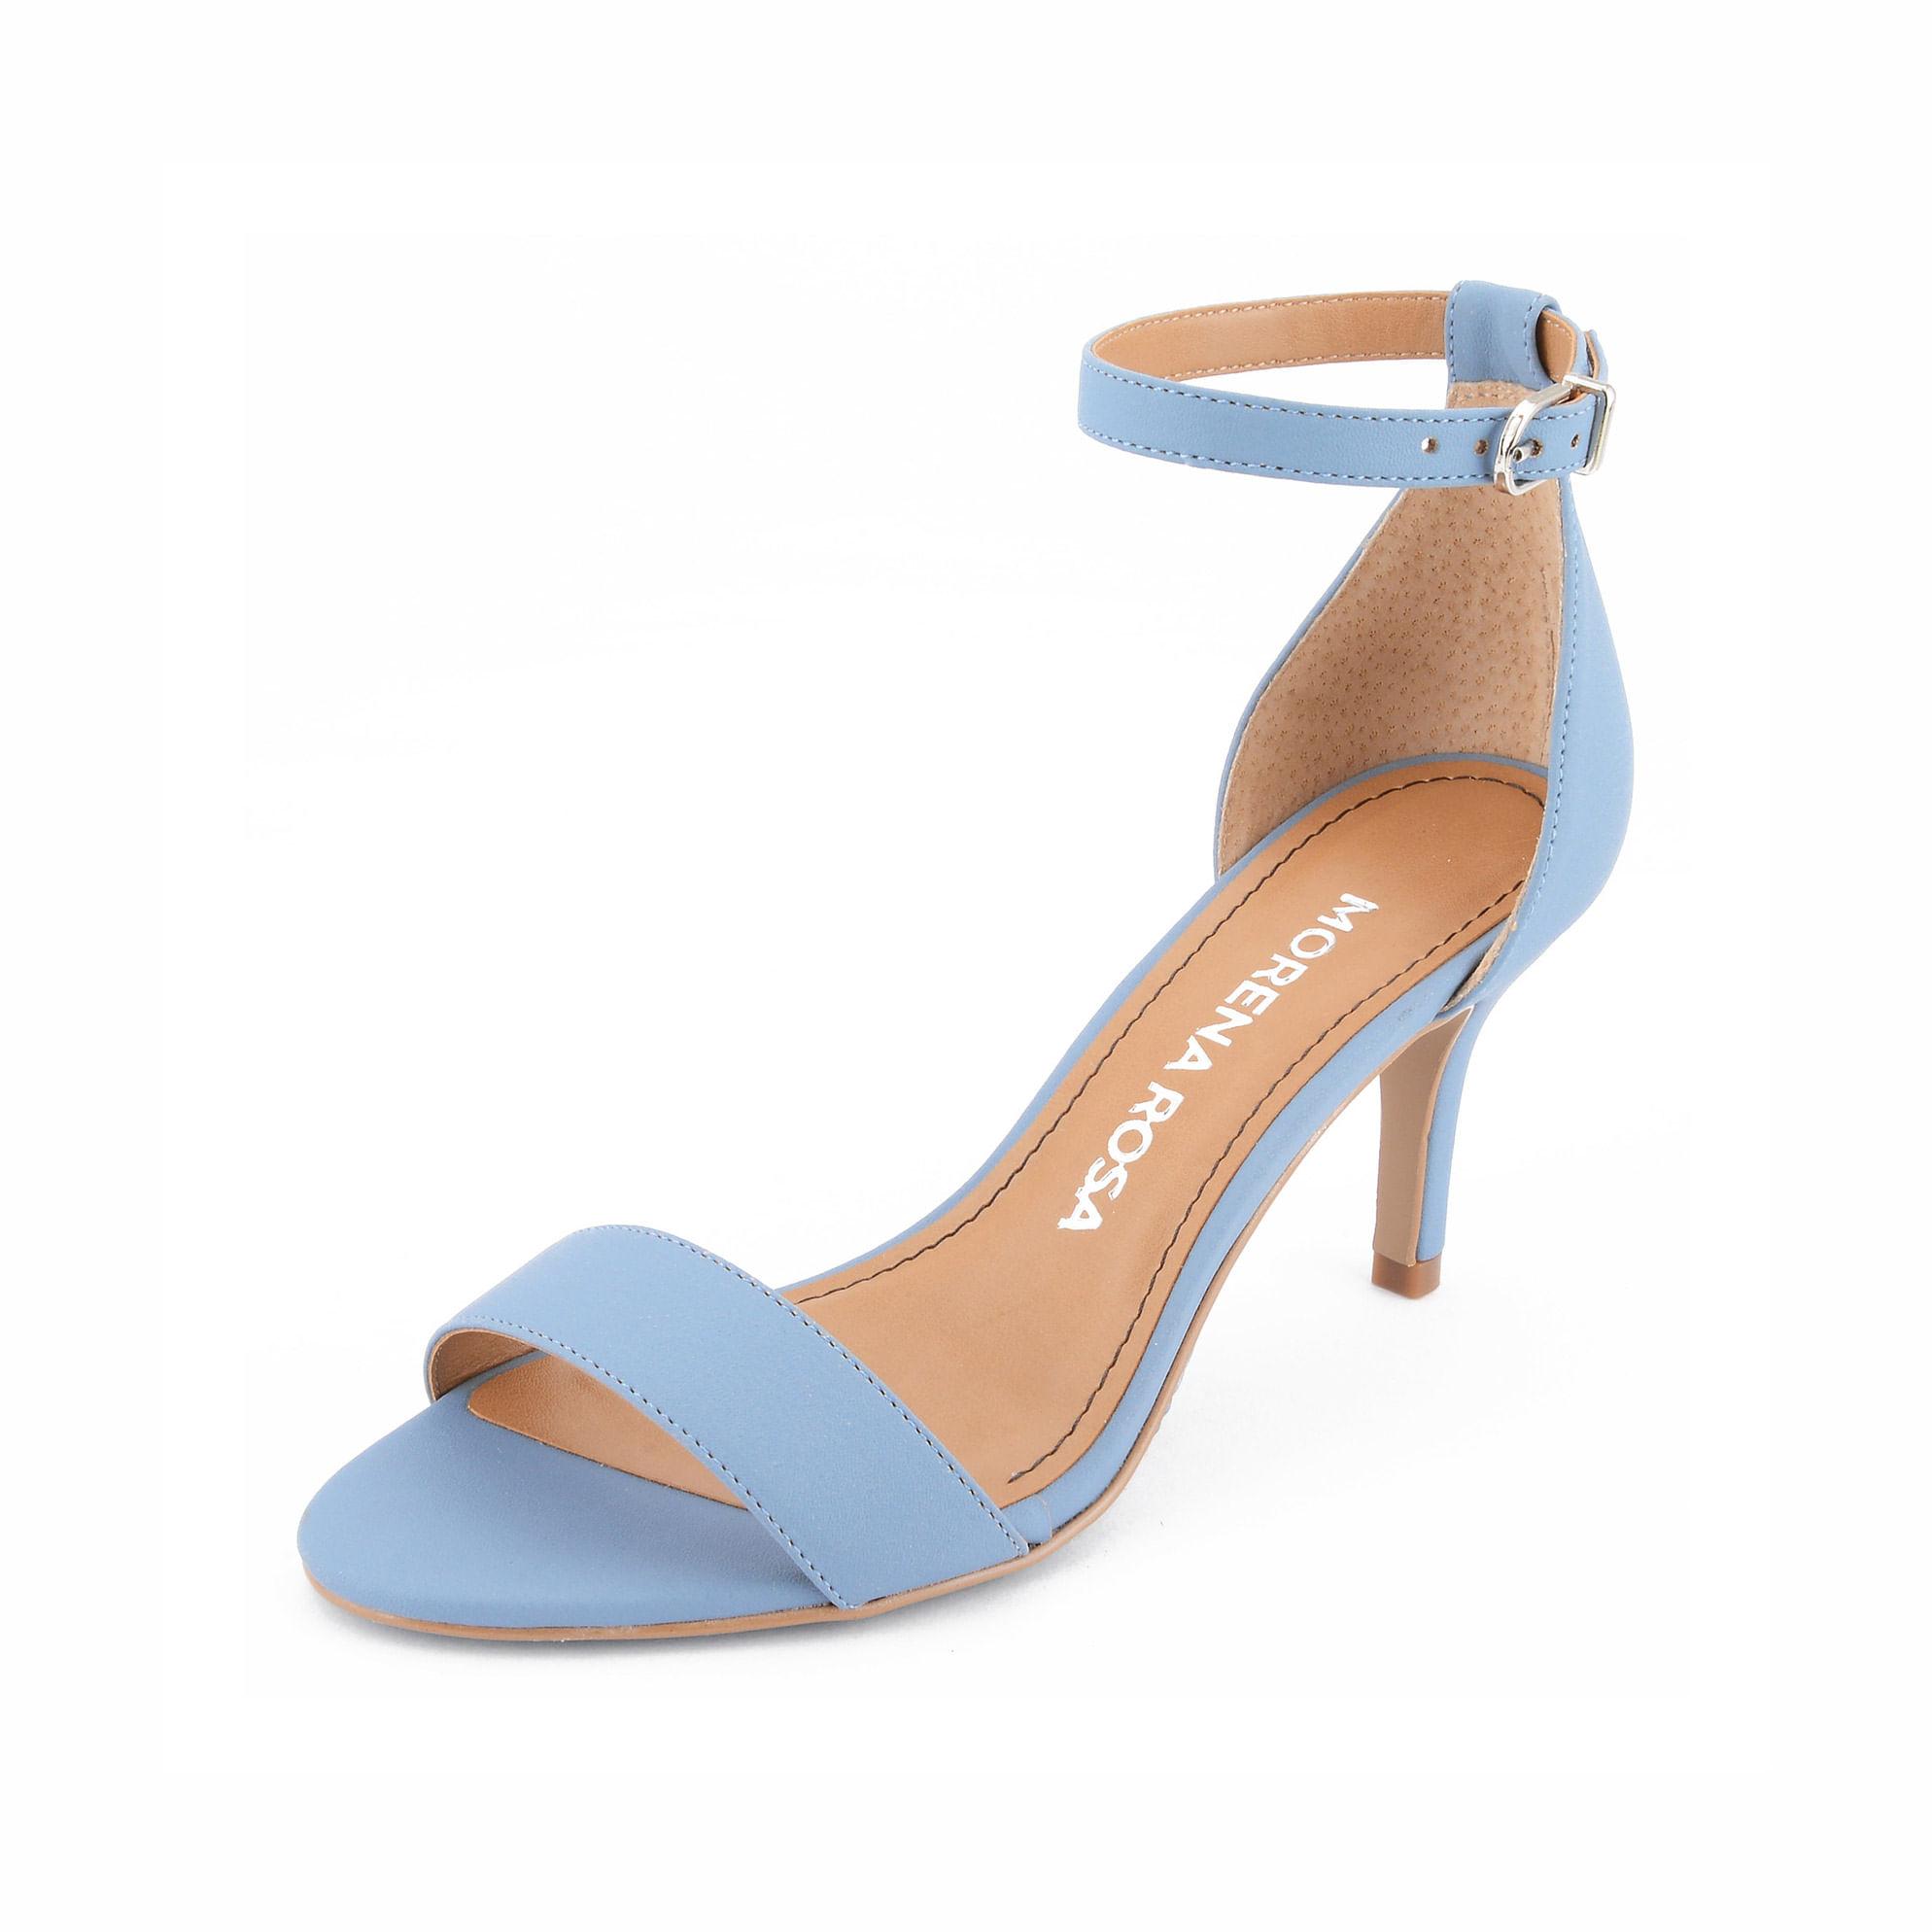 63f096a0ce Sandalia Salto Medio Lisa Azul - morenarosa